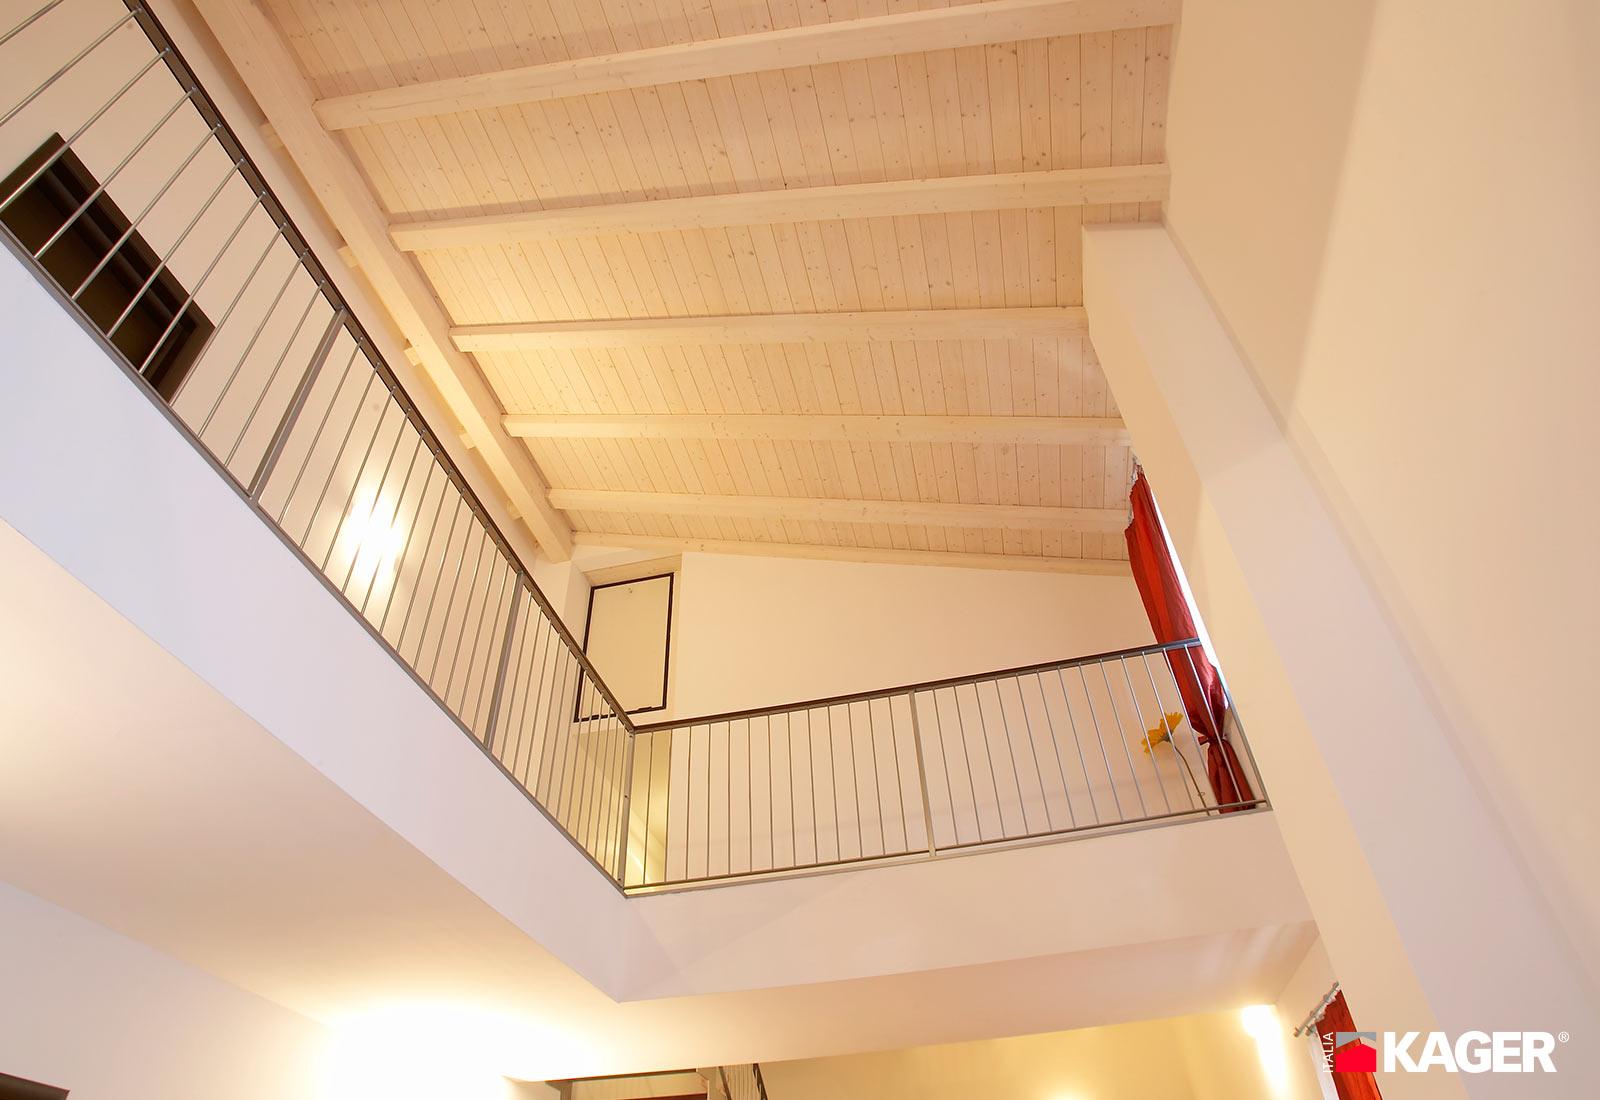 Casa-in-legno-Ferrara-Kager-Italia-11